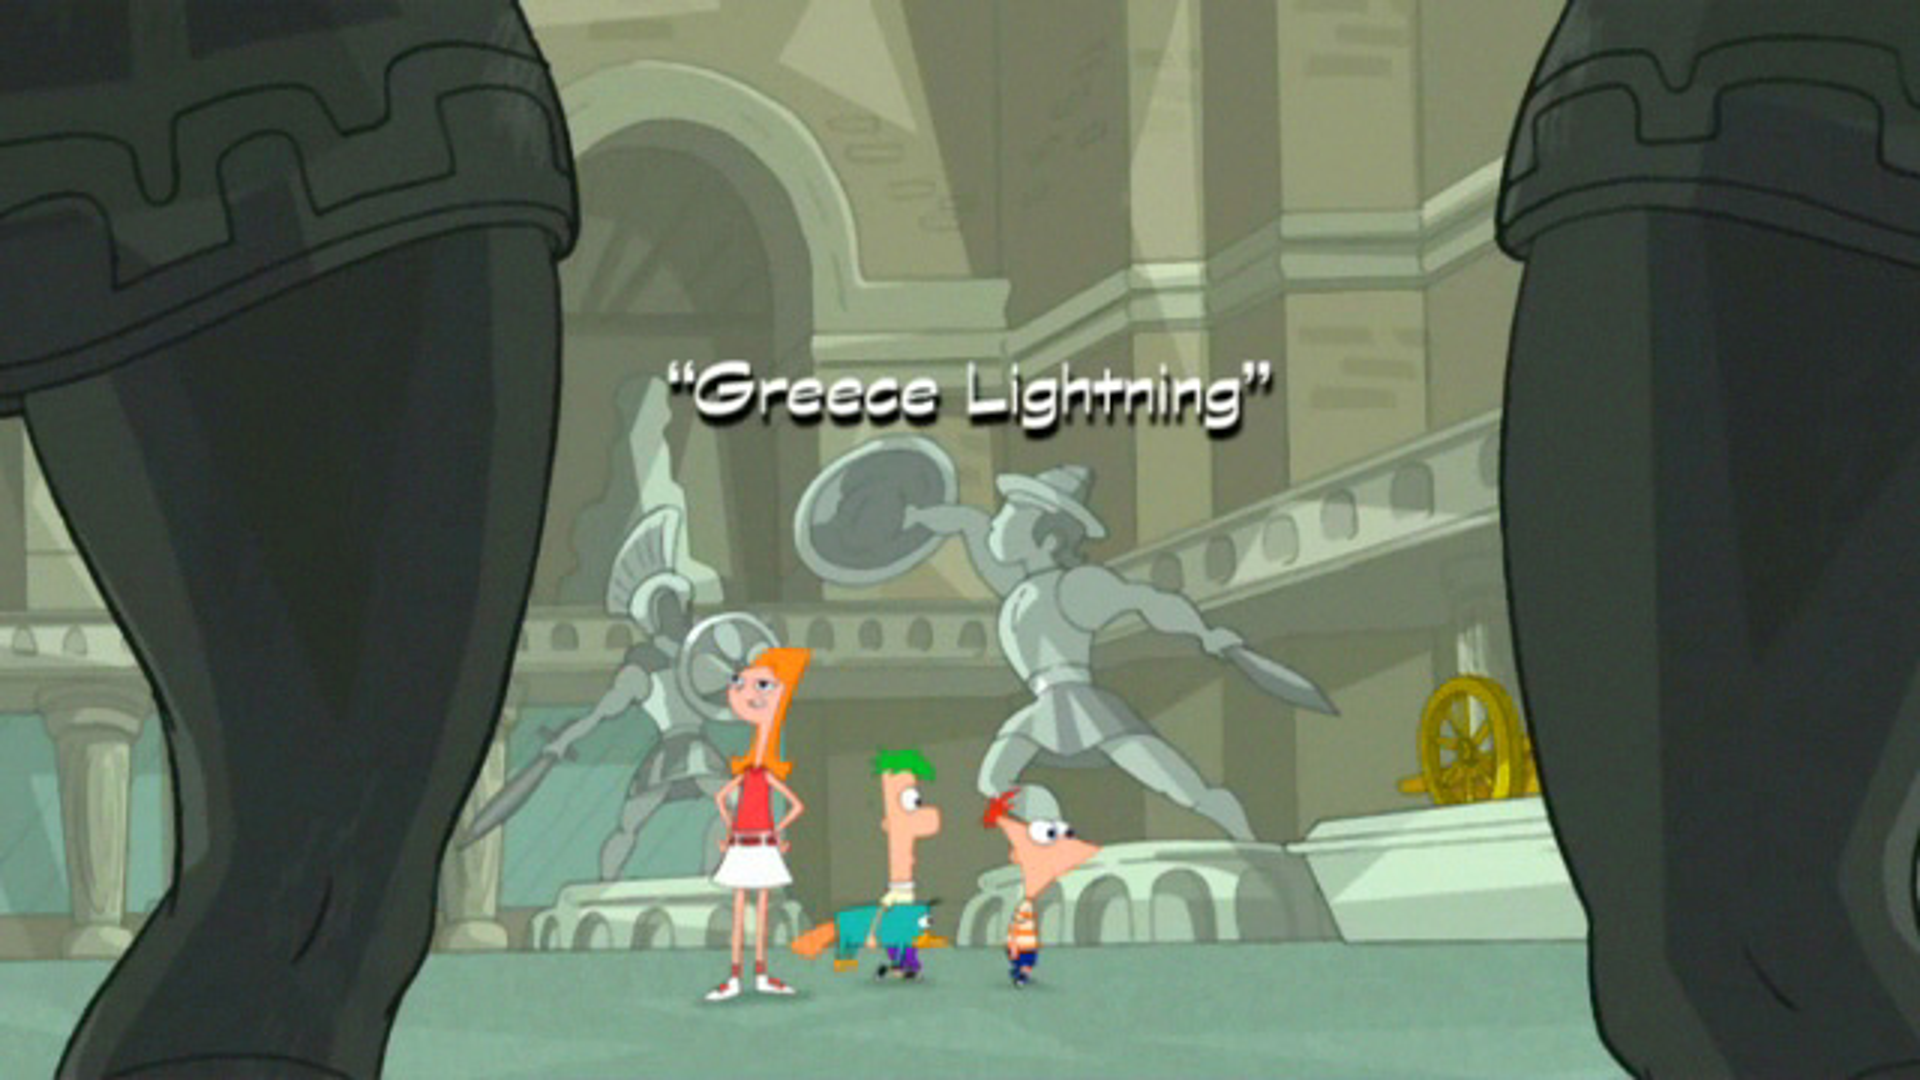 File:Greece Lightning title card.jpg